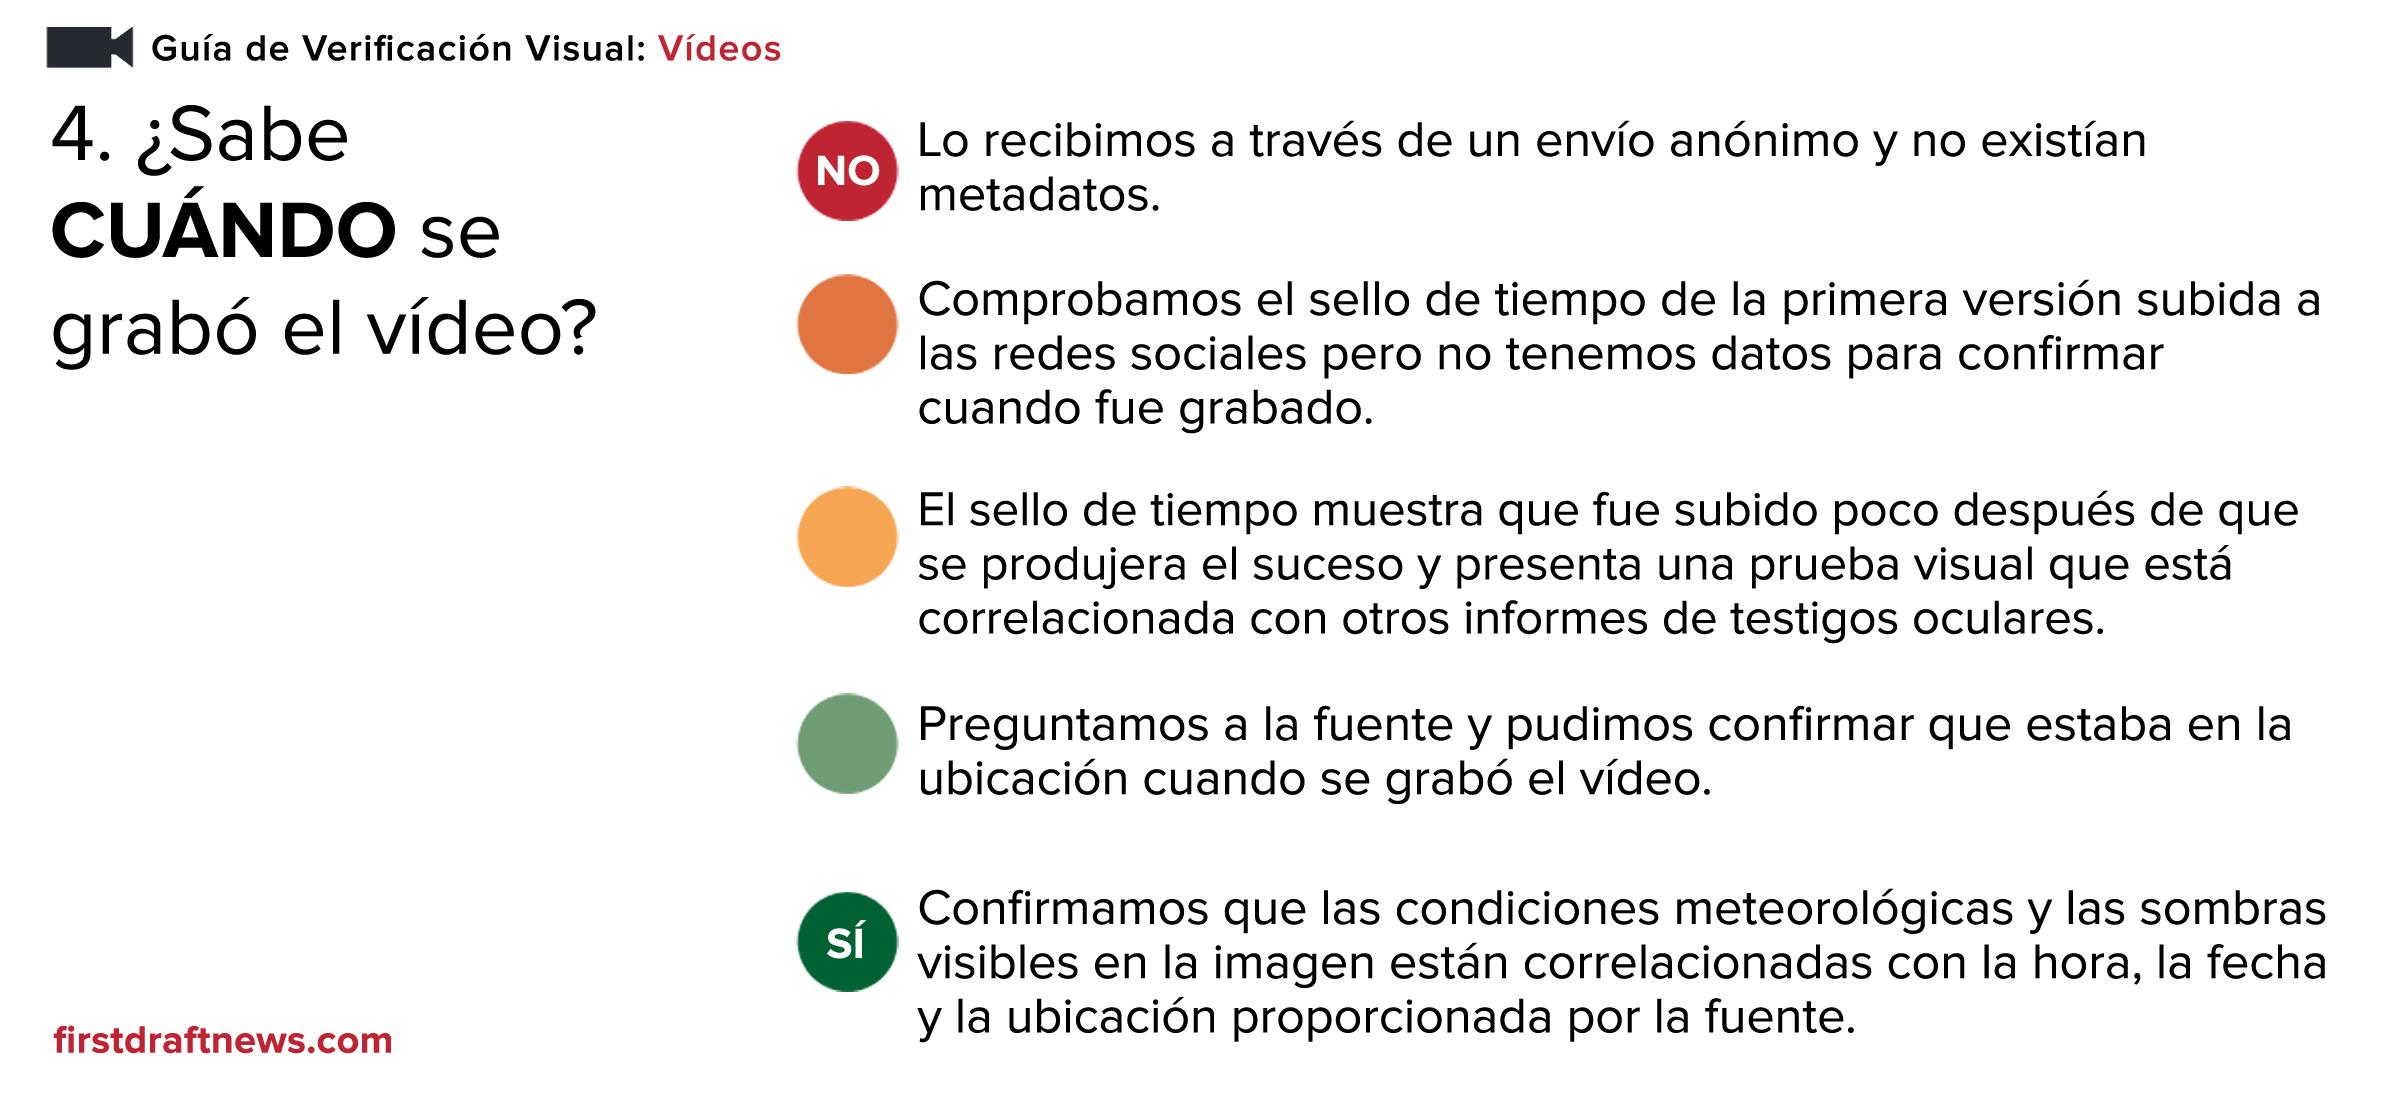 VVG - Video Spanish 4